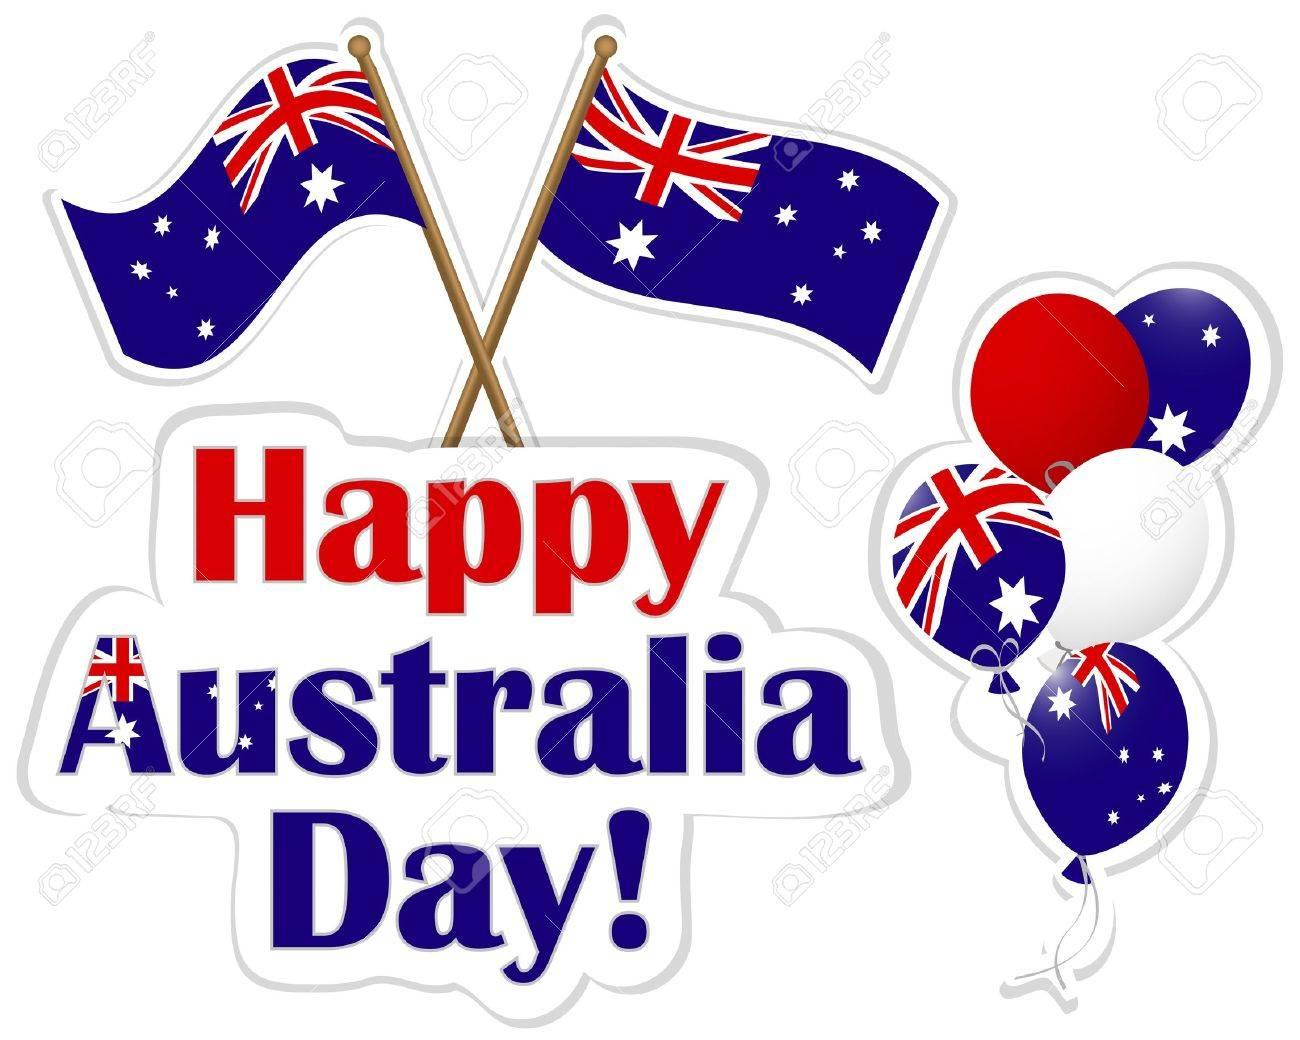 Australia day clipart 6 » Clipart Station.